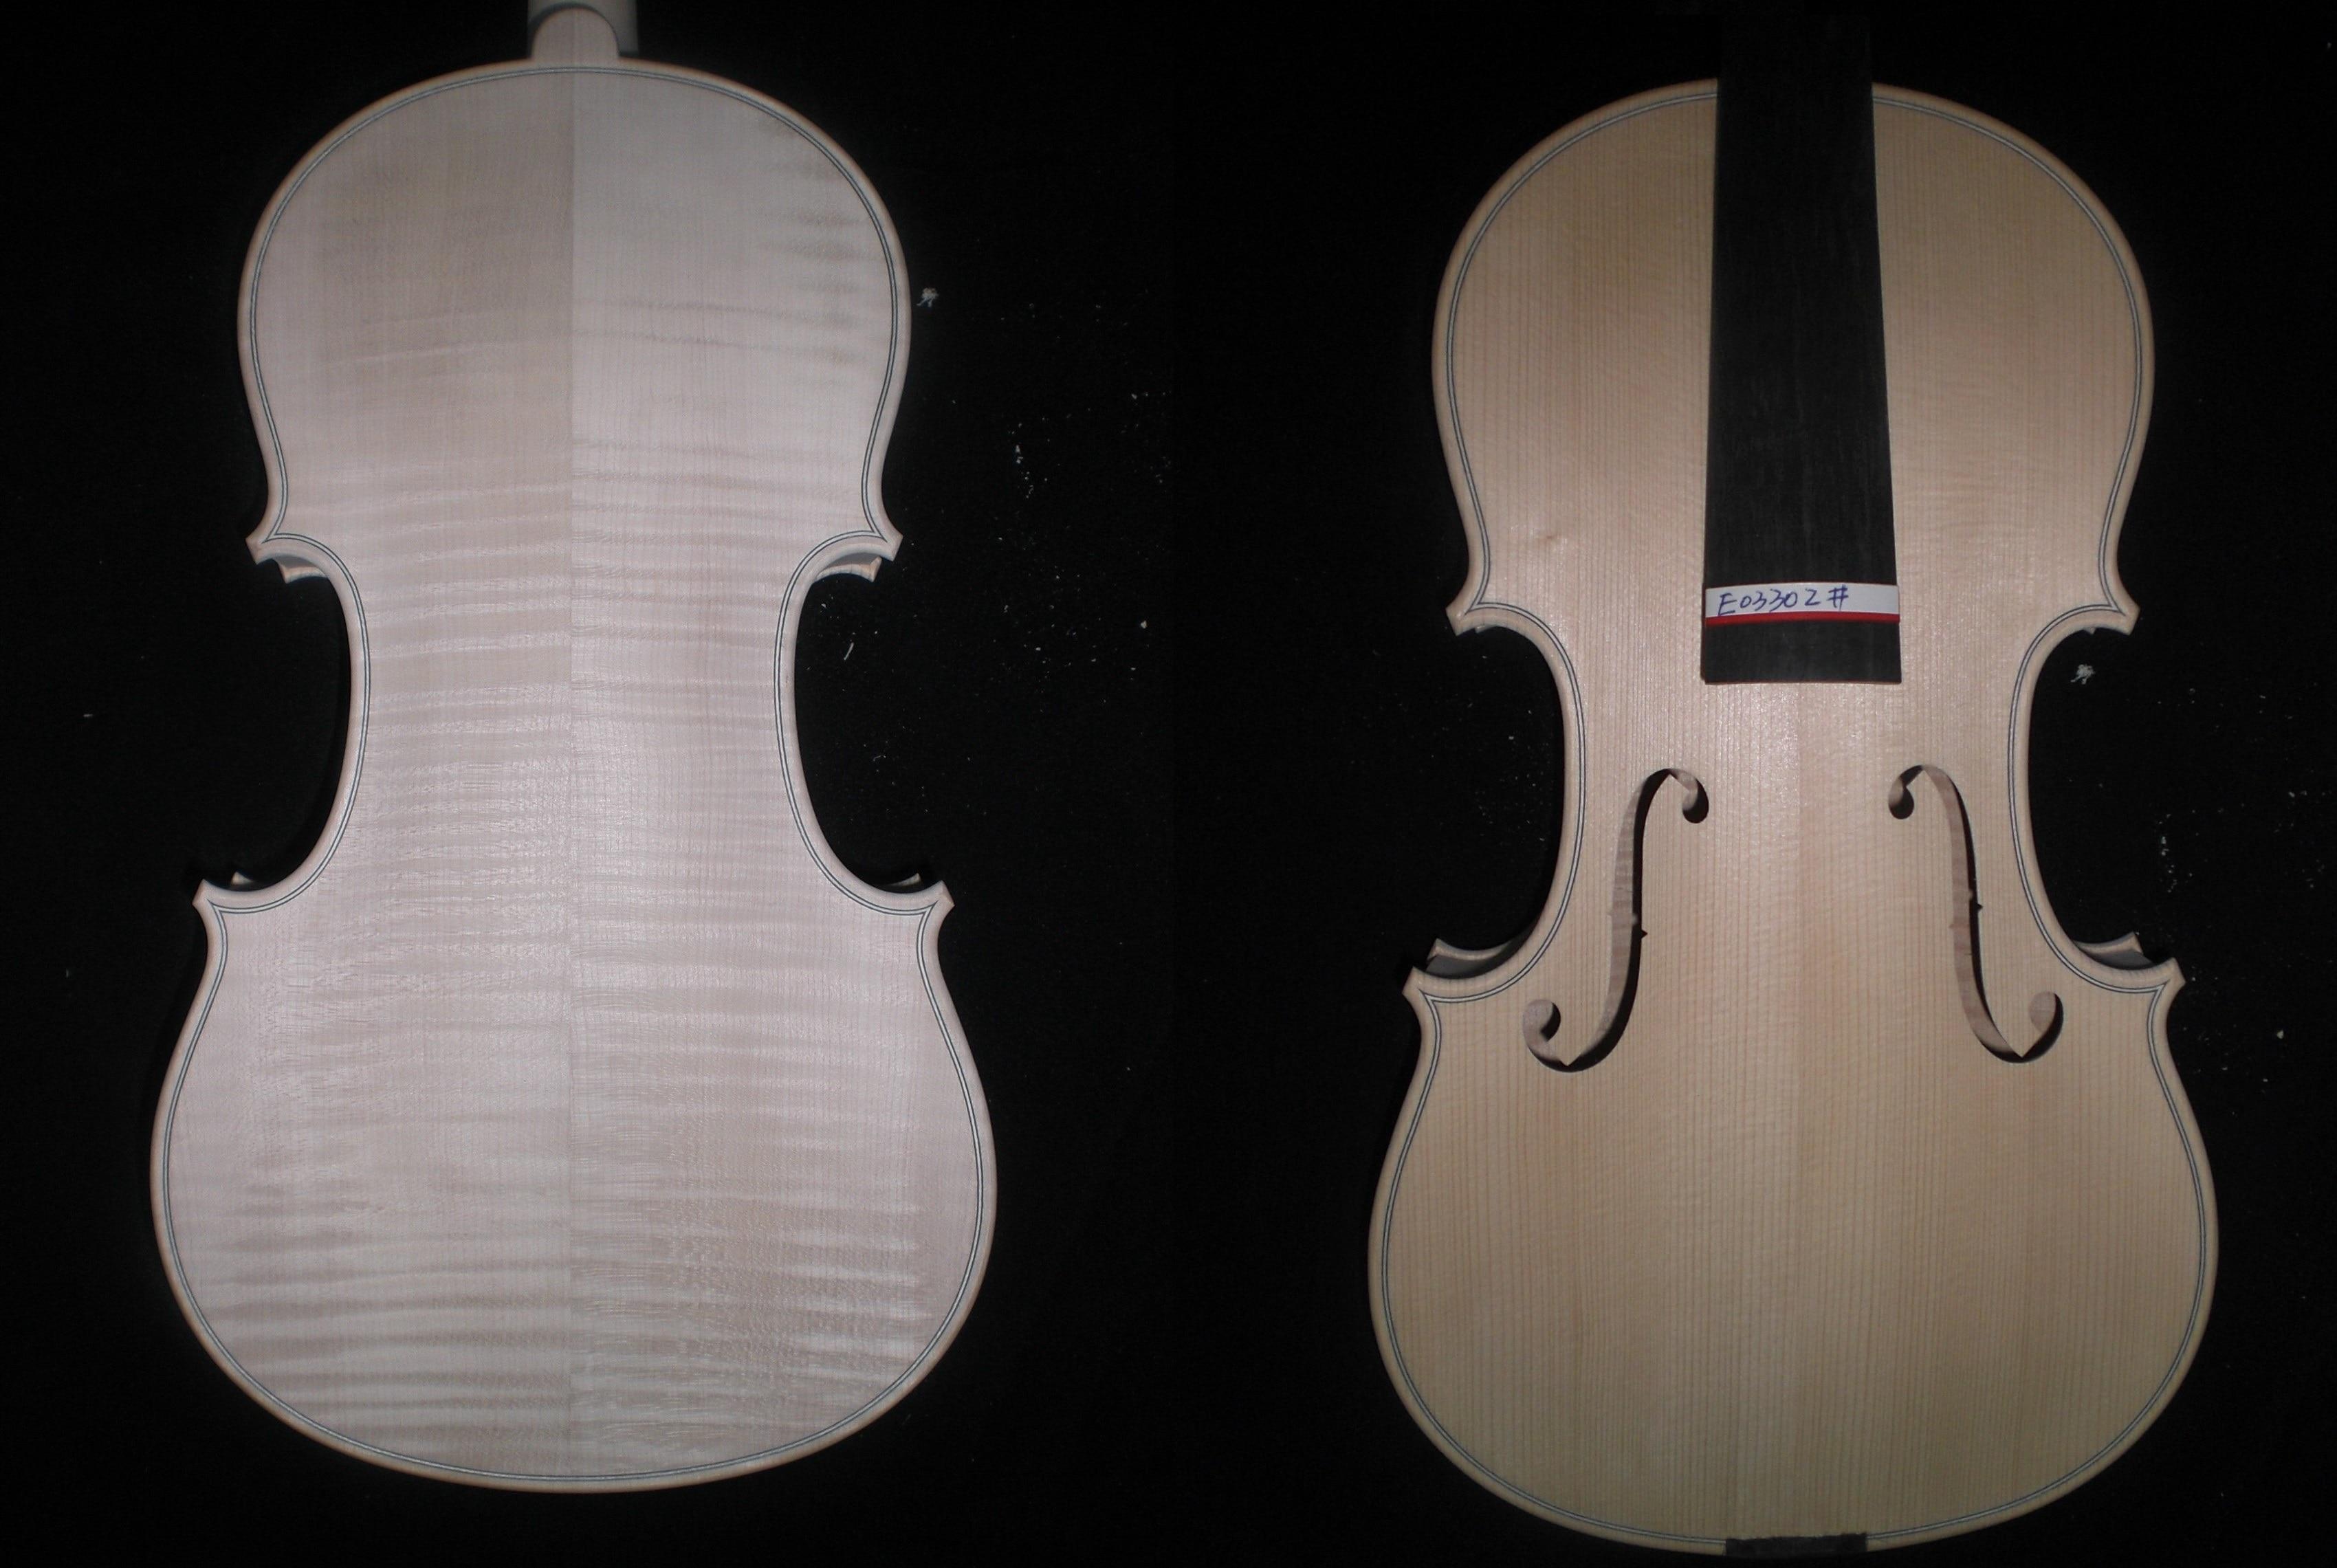 European Wood White Violin Flame Maple Back 4/4 Spruce Top Ebony Fingerboard E03302# 2 pcs new 4 4 unfinished violin flame maple back russian spruce top